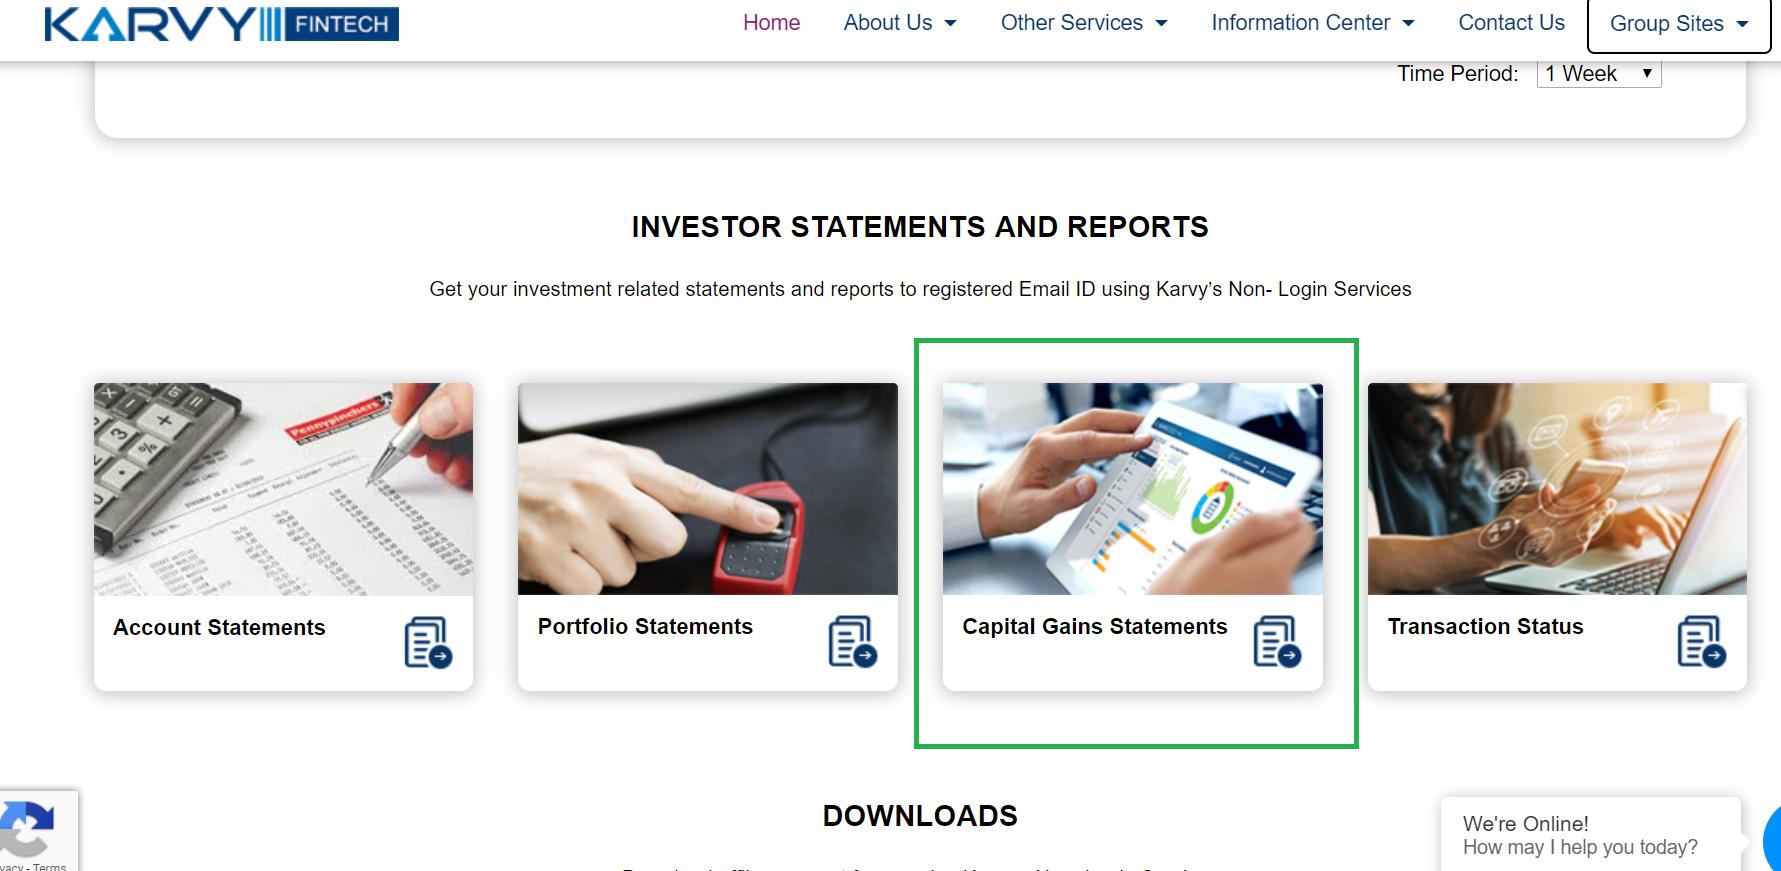 KARVY - Capital Gains Statements Option